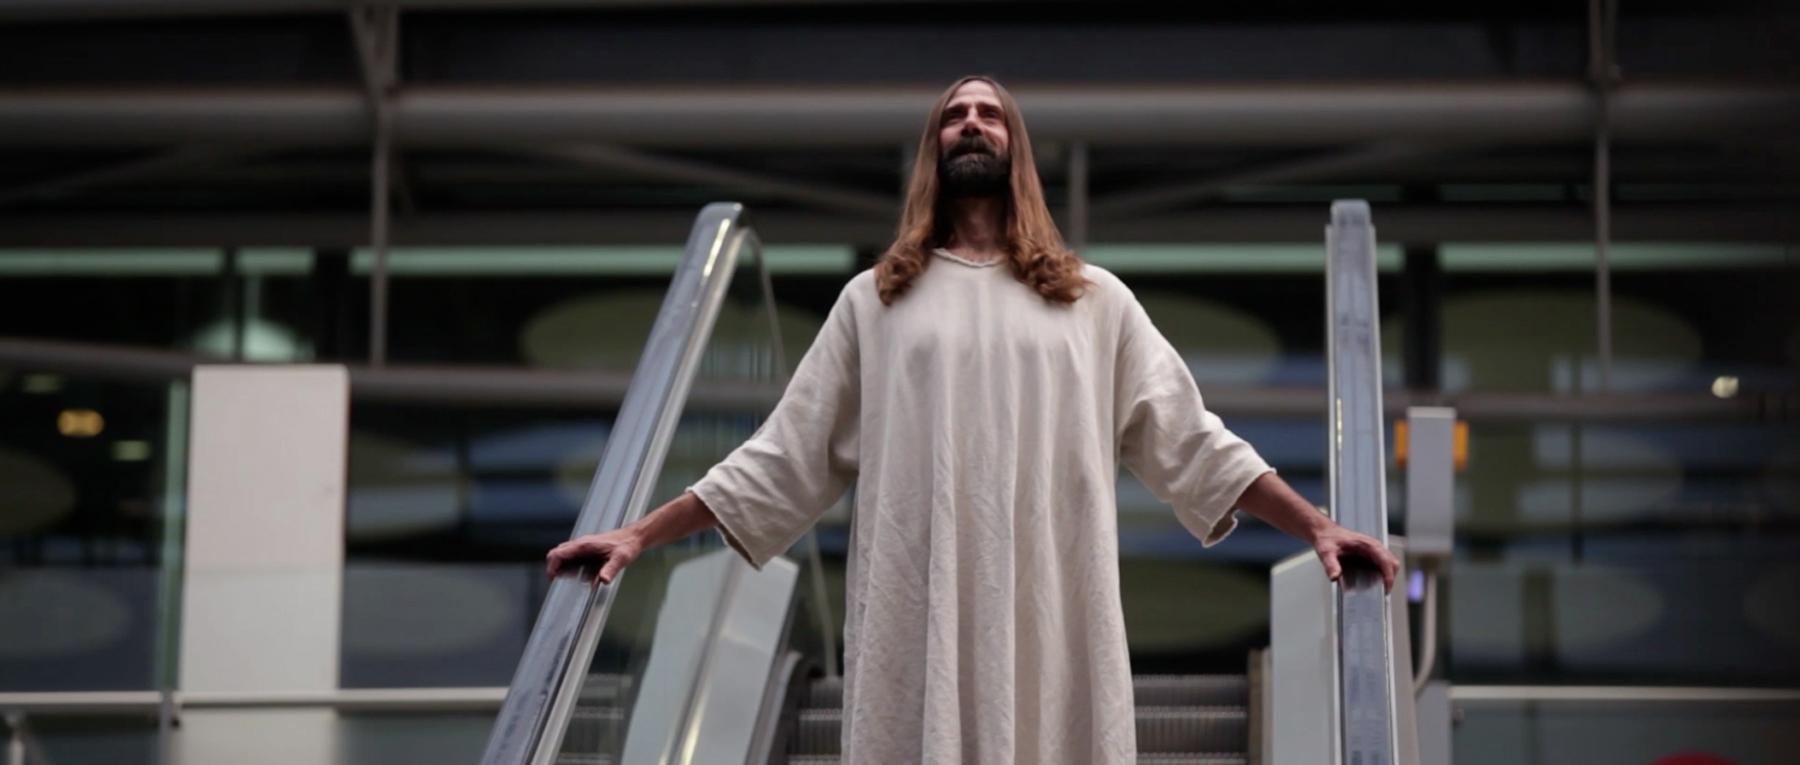 Mother signs biggest client ever -- Jesus Christ http://t.co/DALDKyleuz http://t.co/kClZ2kBank